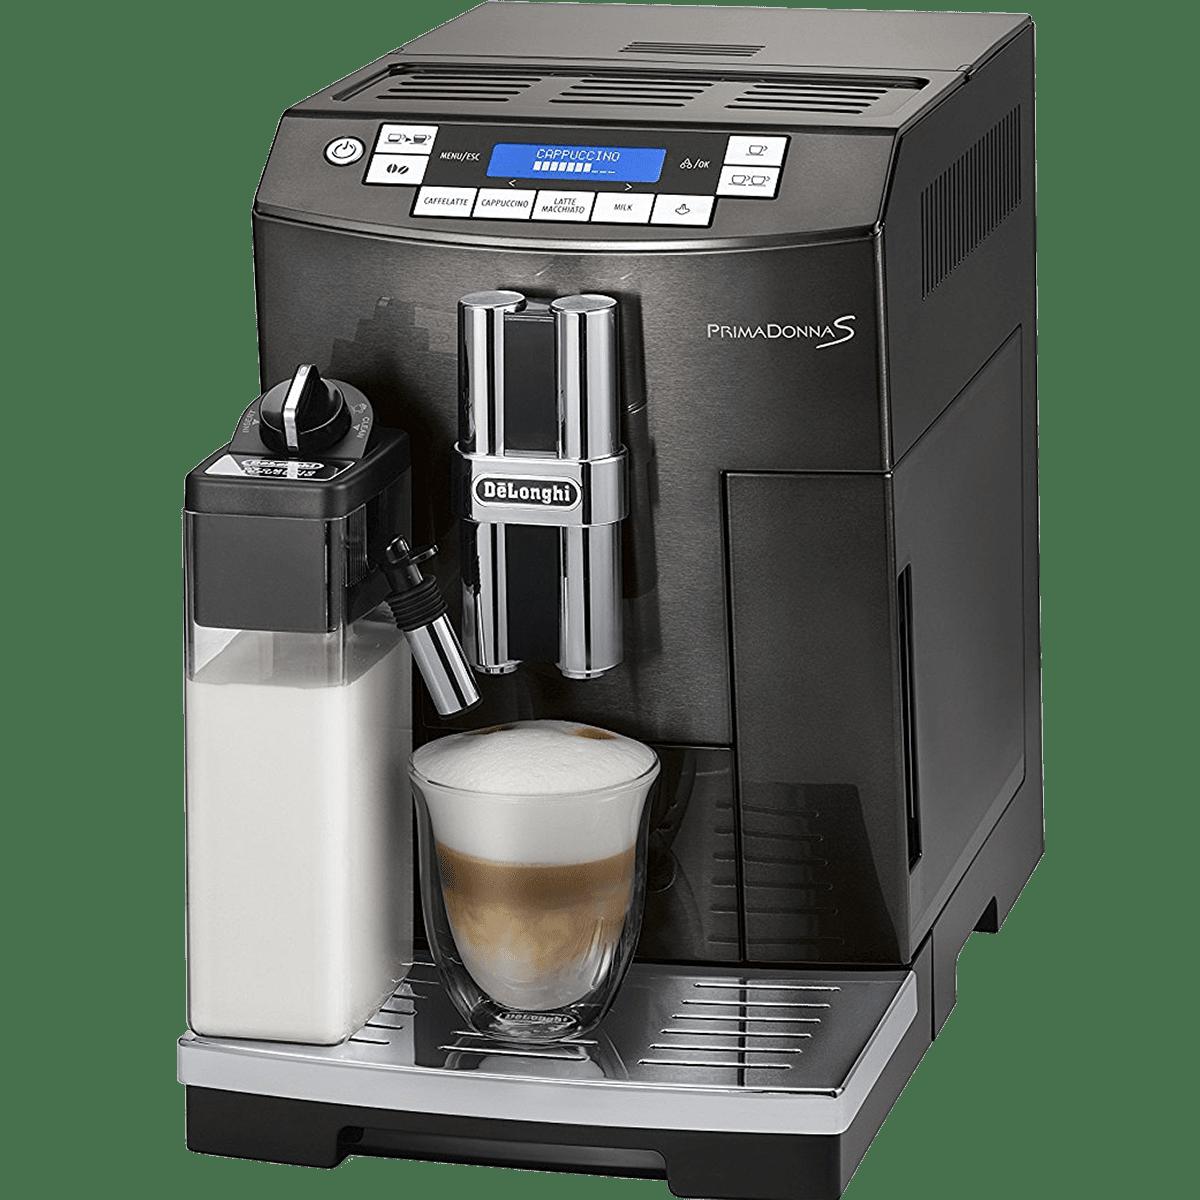 delonghi ecam28465 primadonna s automatic espresso machine quench essentials. Black Bedroom Furniture Sets. Home Design Ideas